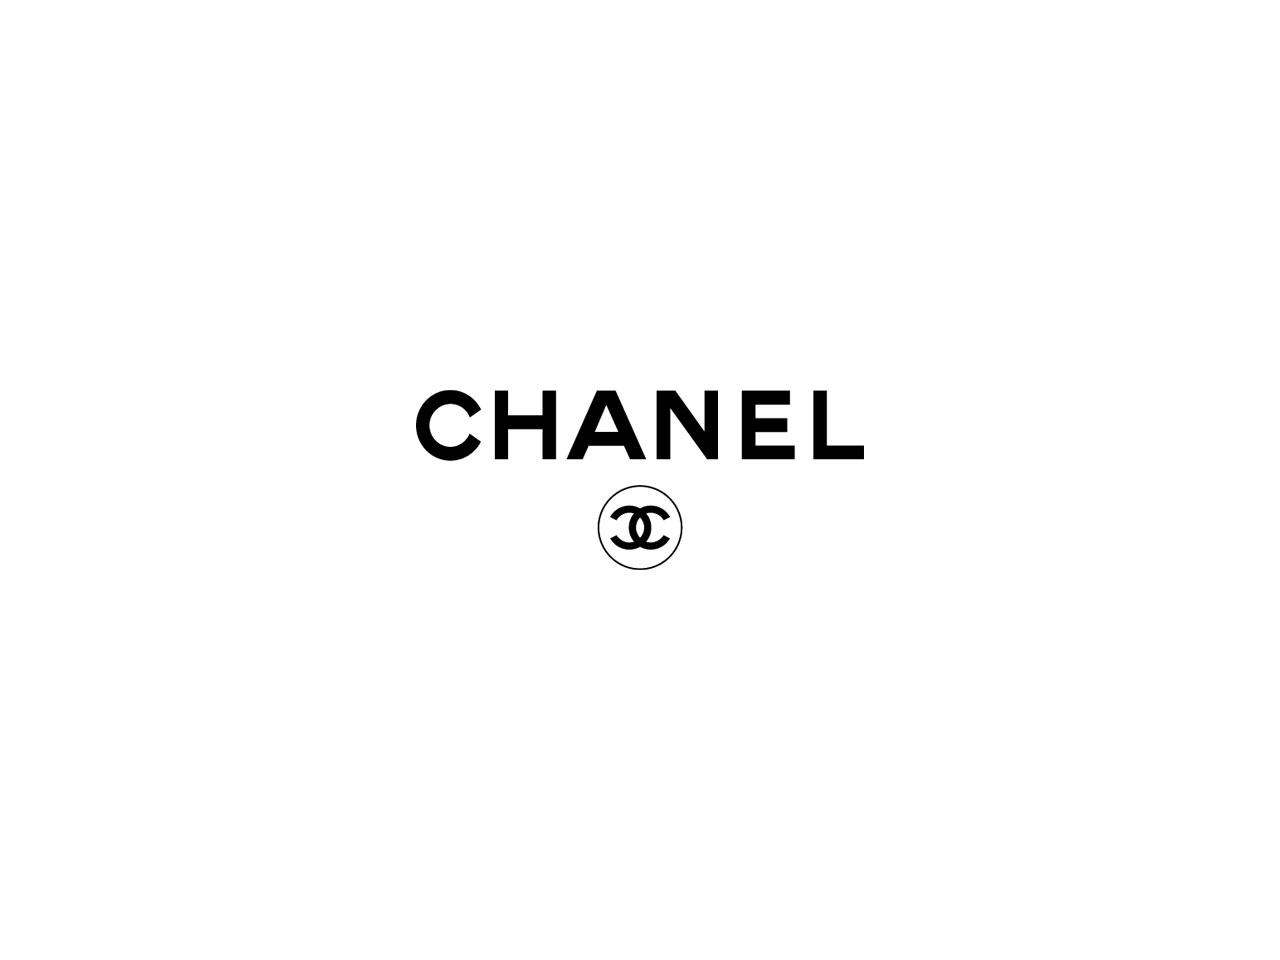 CHANEL 1280x960